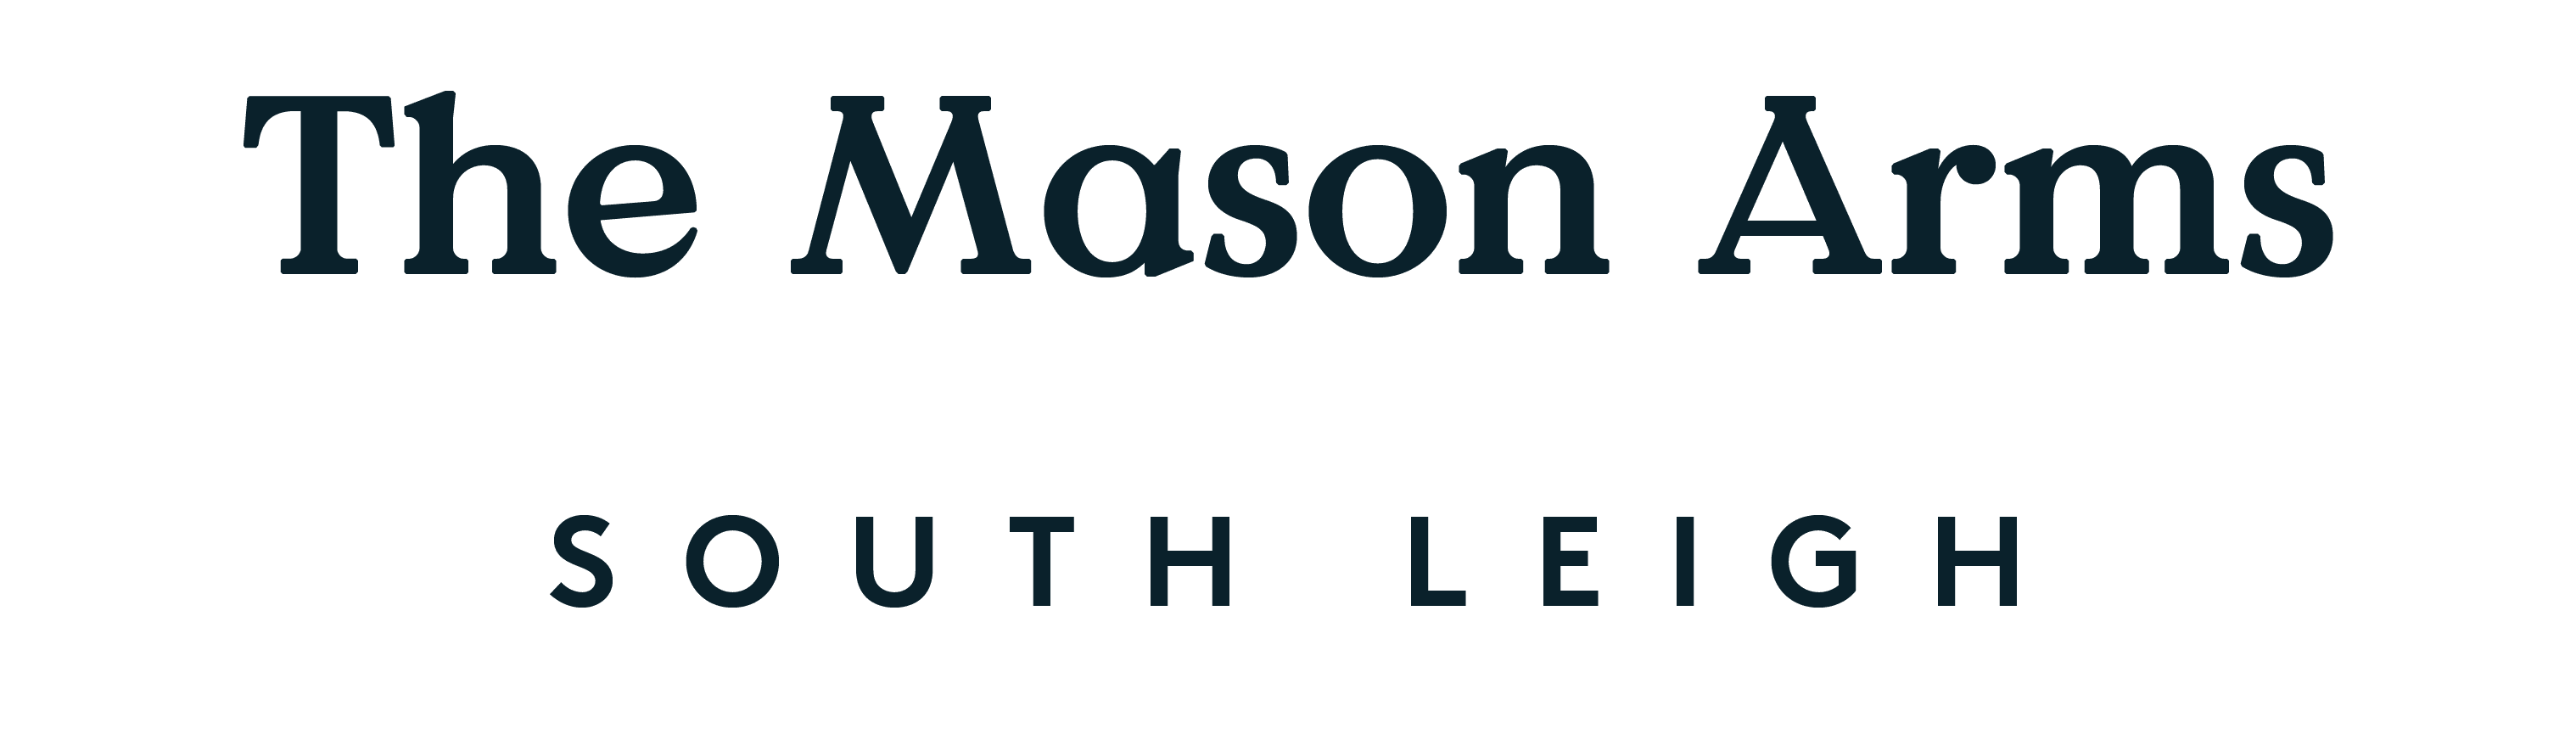 Artist Residence Logo - The Mason Arms